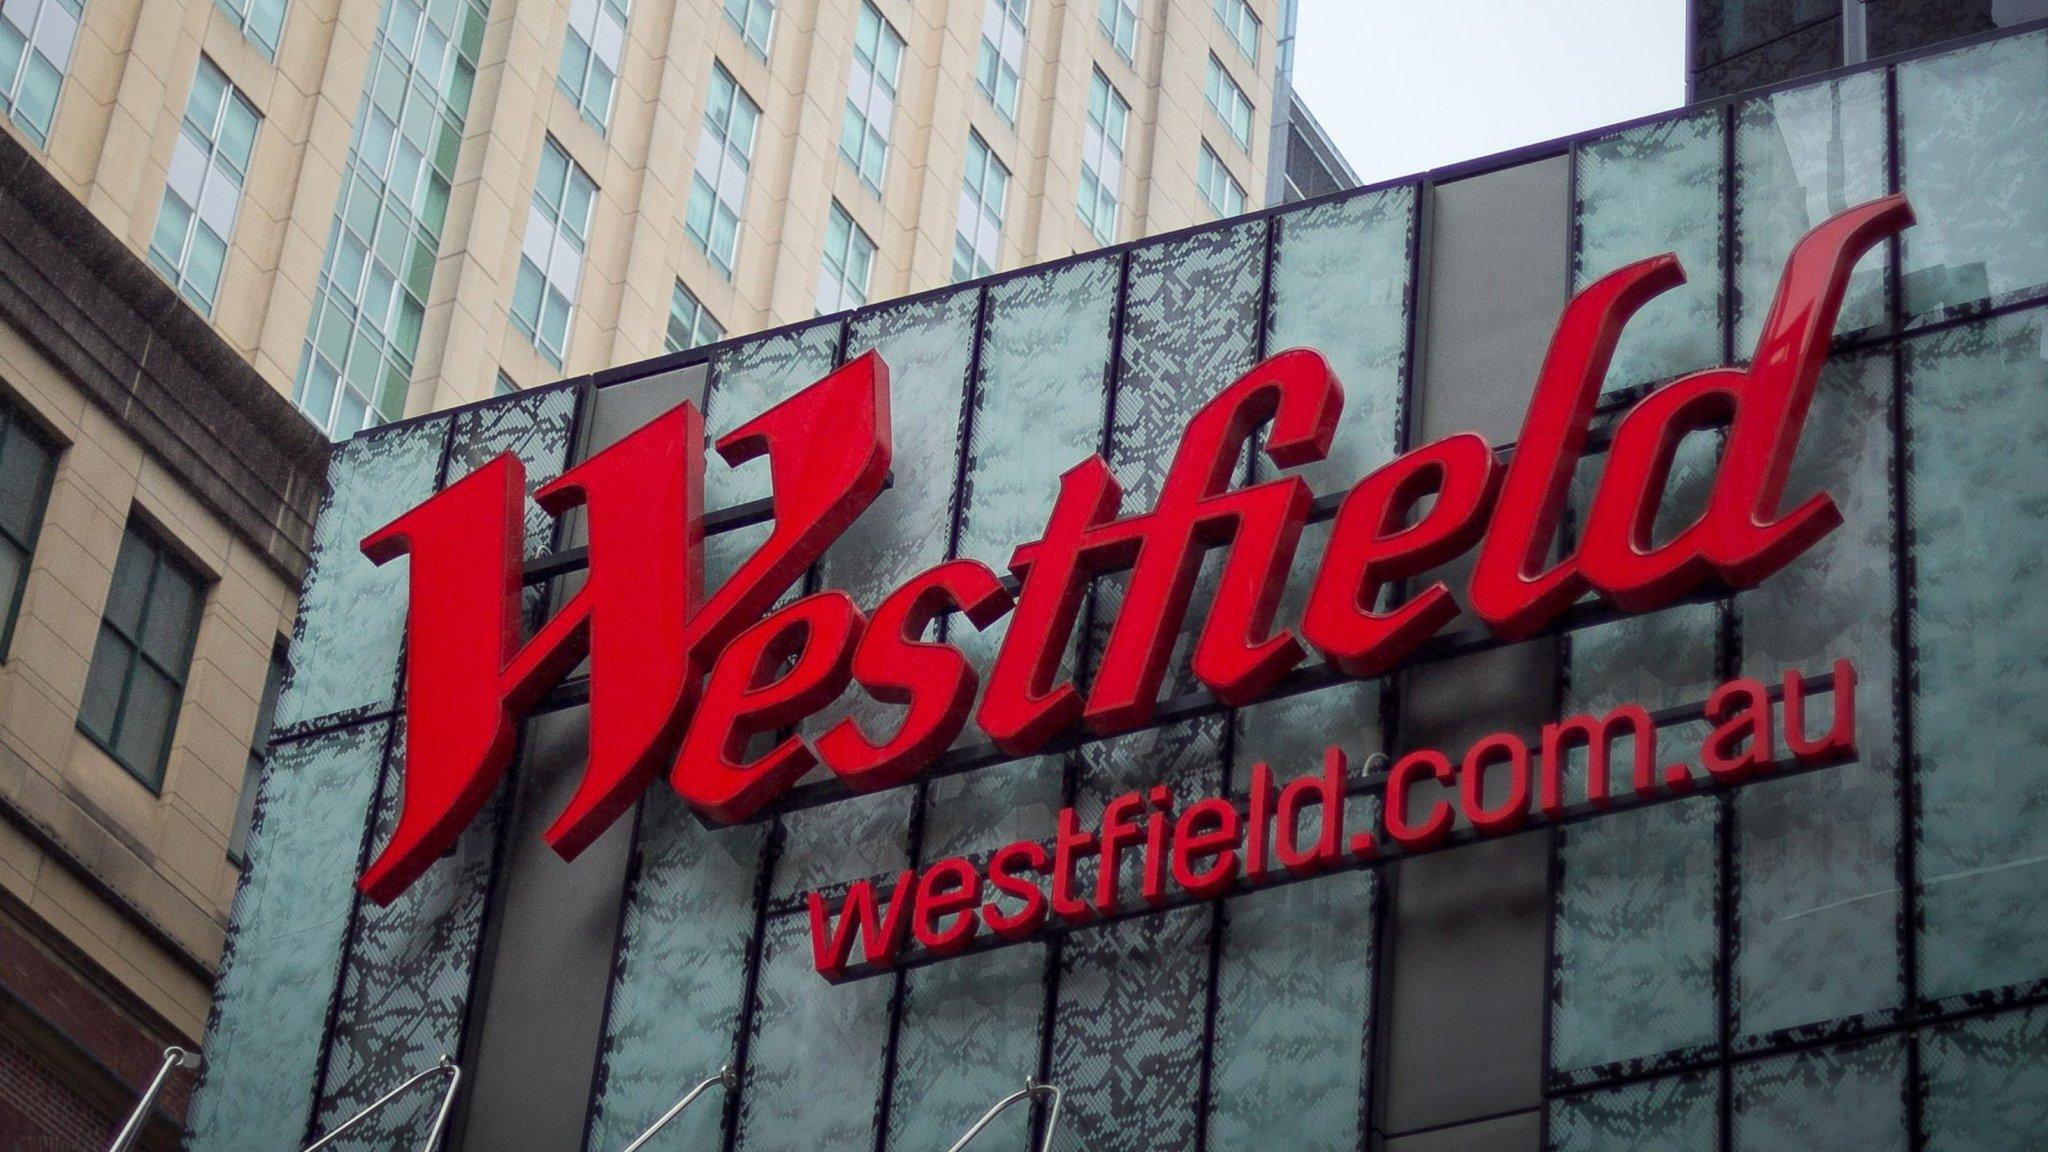 Unibail-Rodamco to buy Australia's Westfield for $25bn